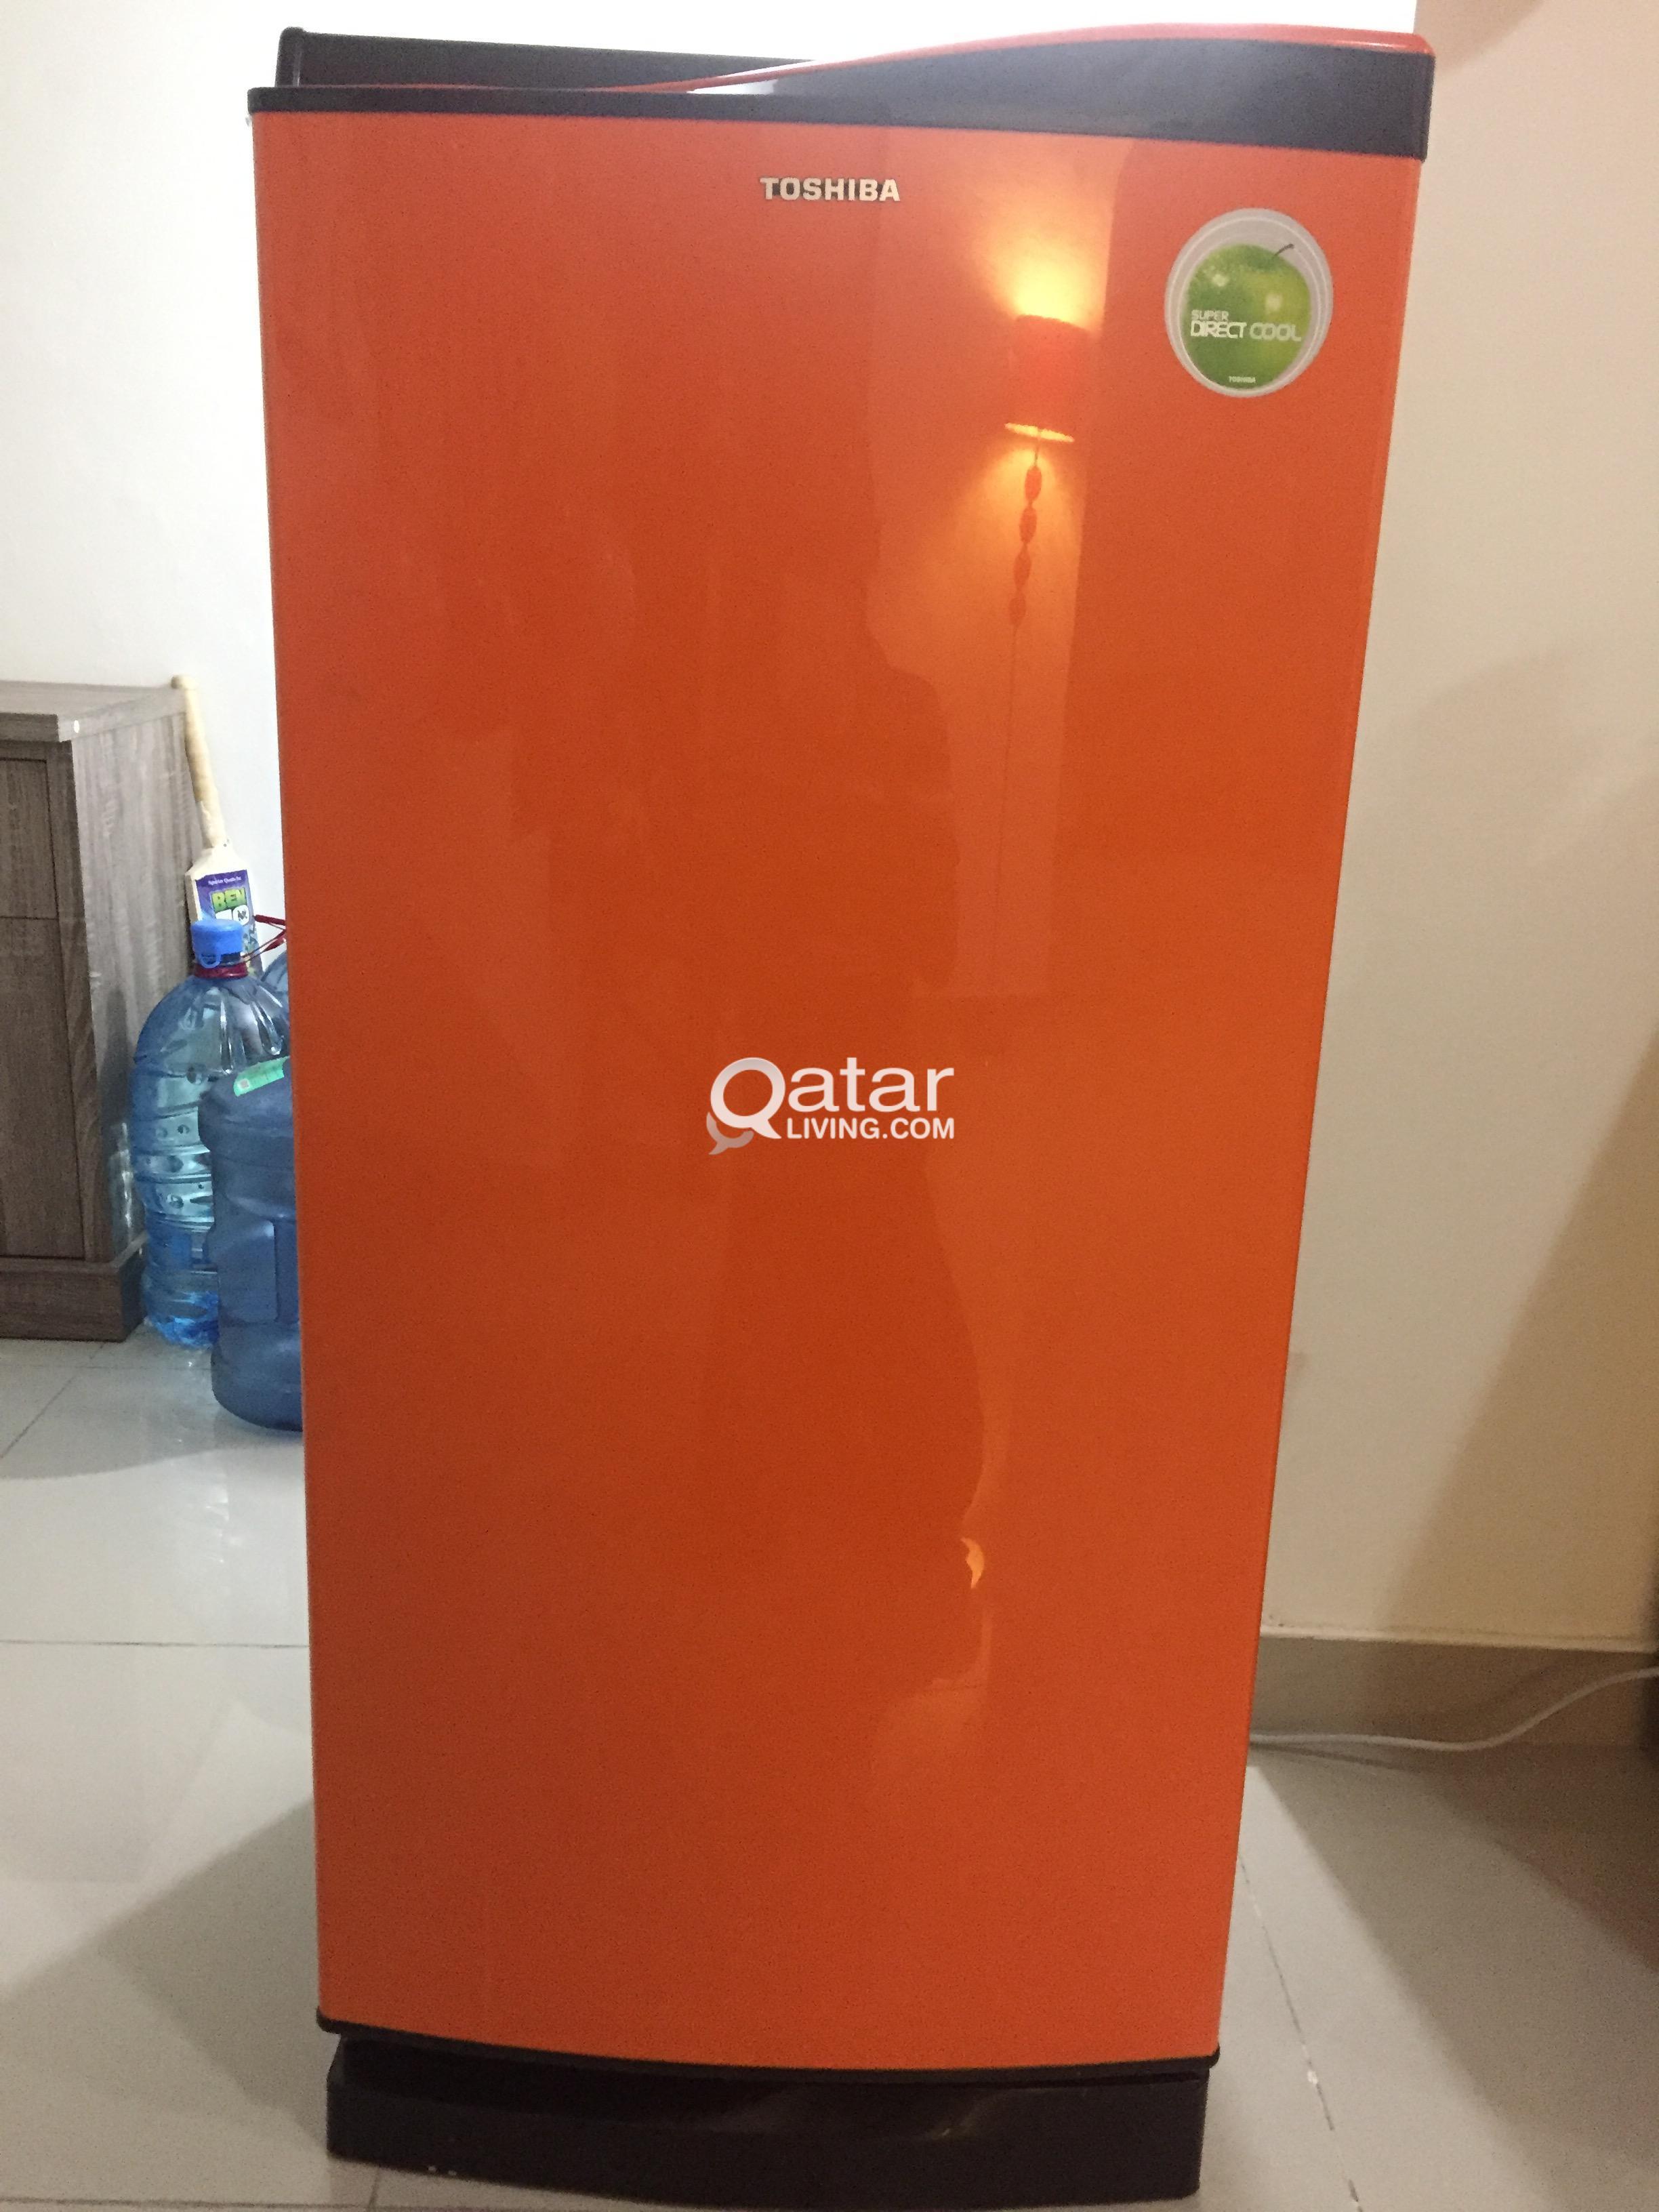 Toshiba fridge for sale